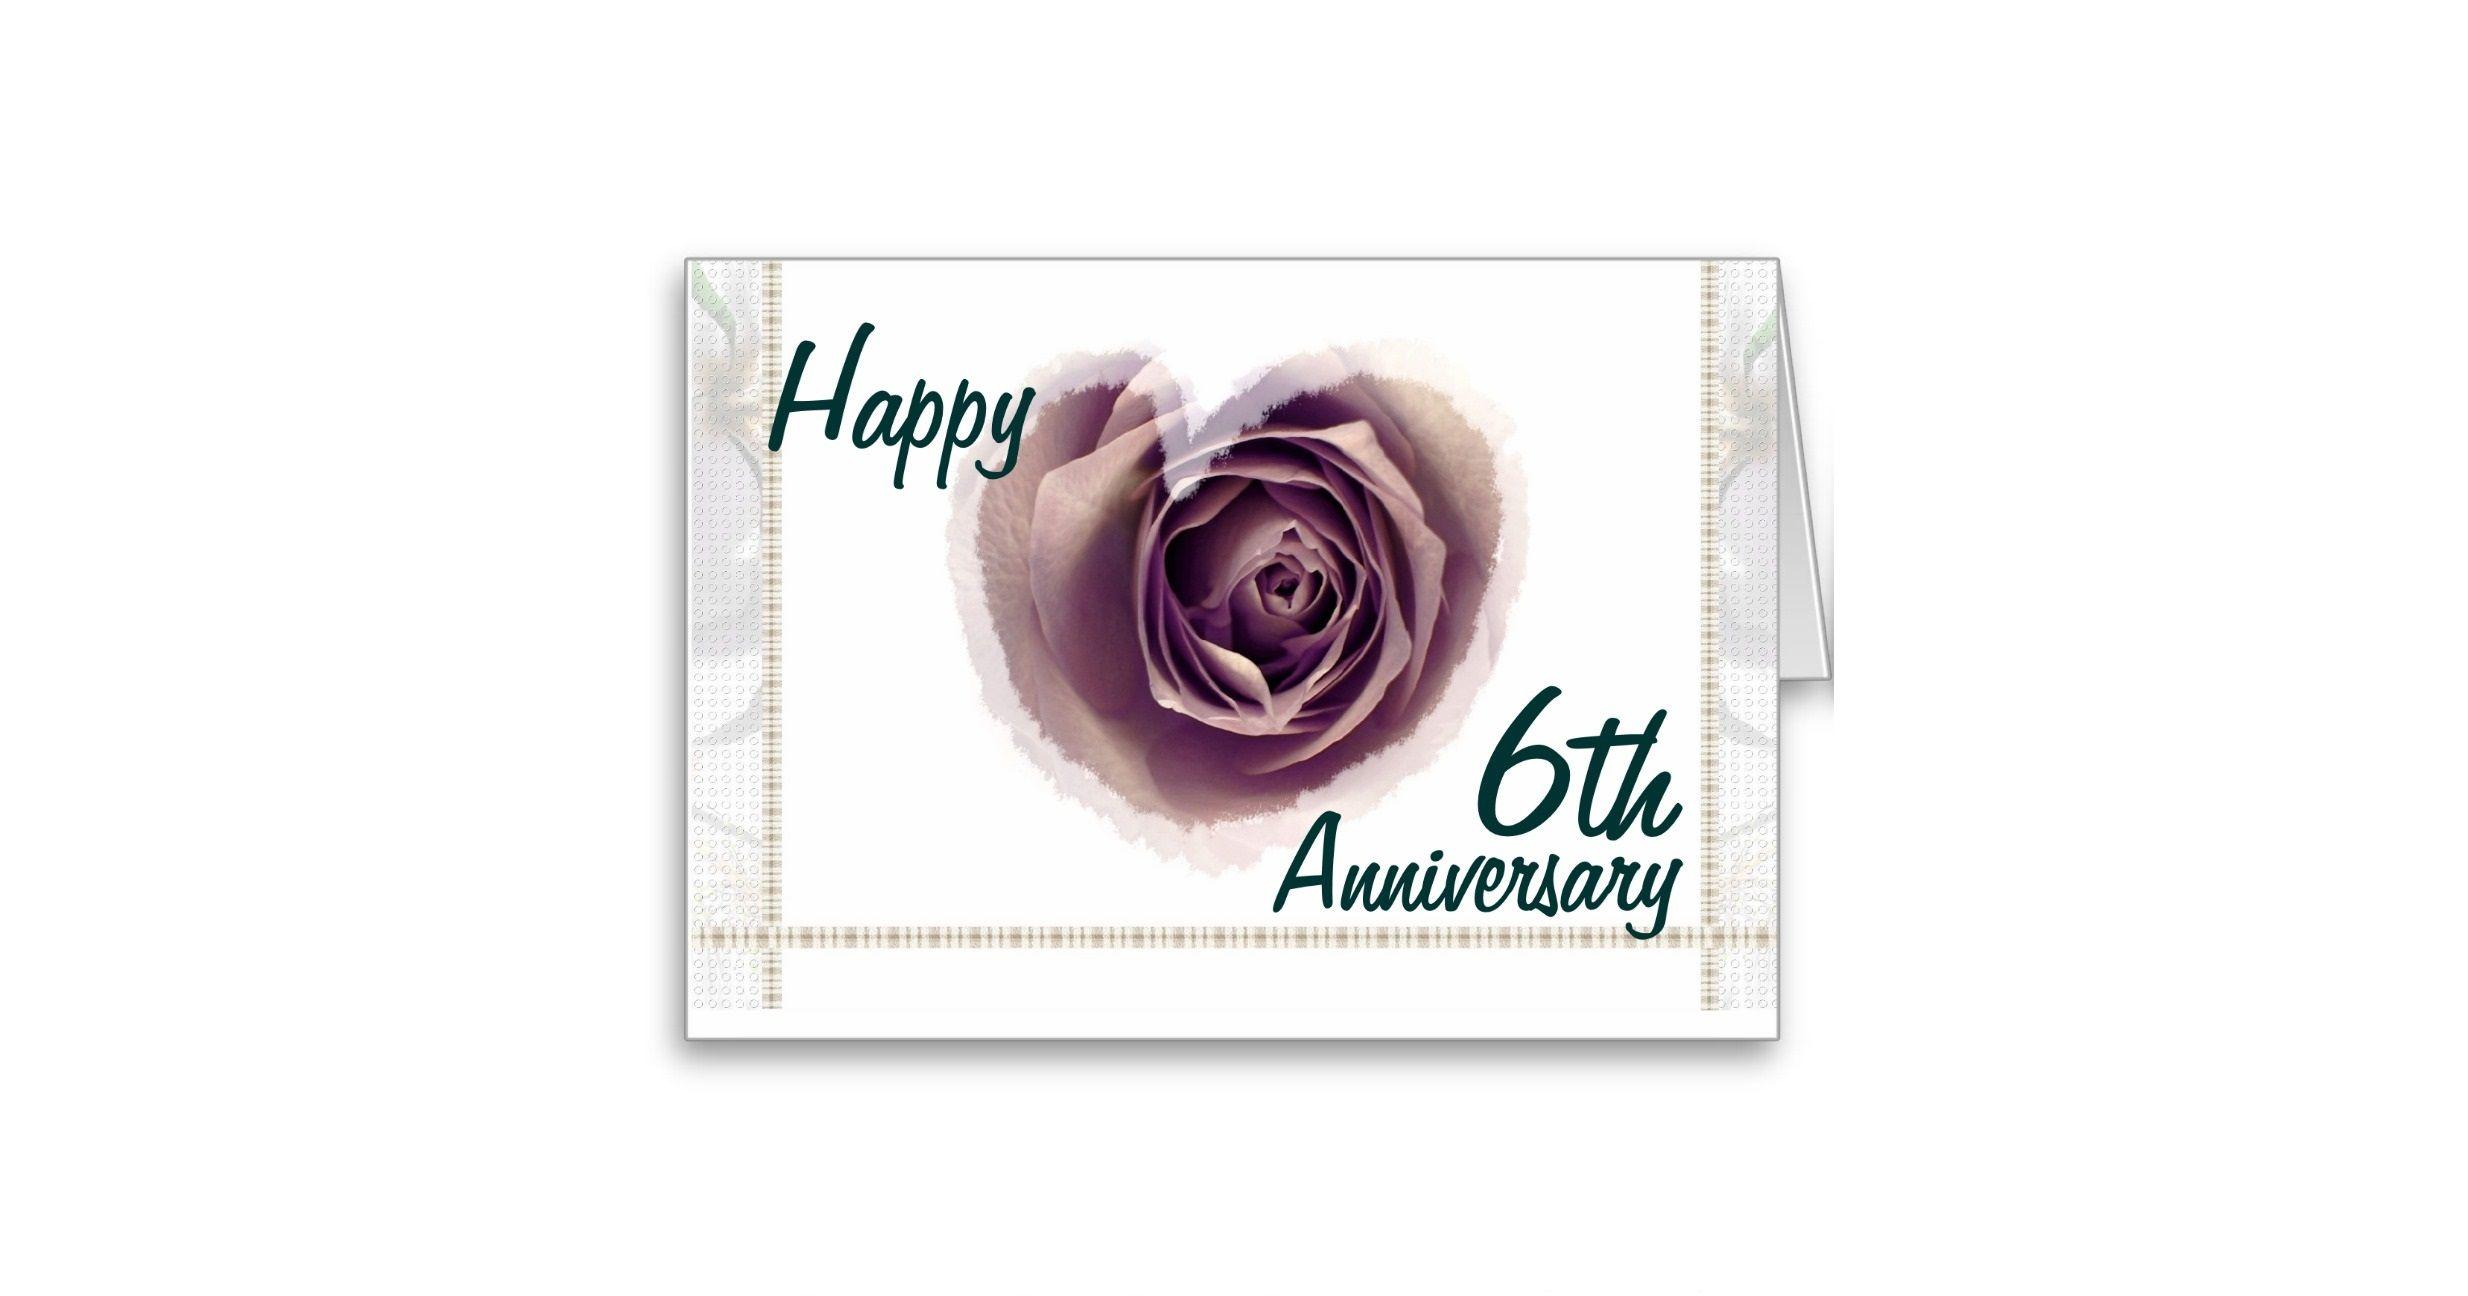 6th_wedding_anniversary_purple_rose_heart_card